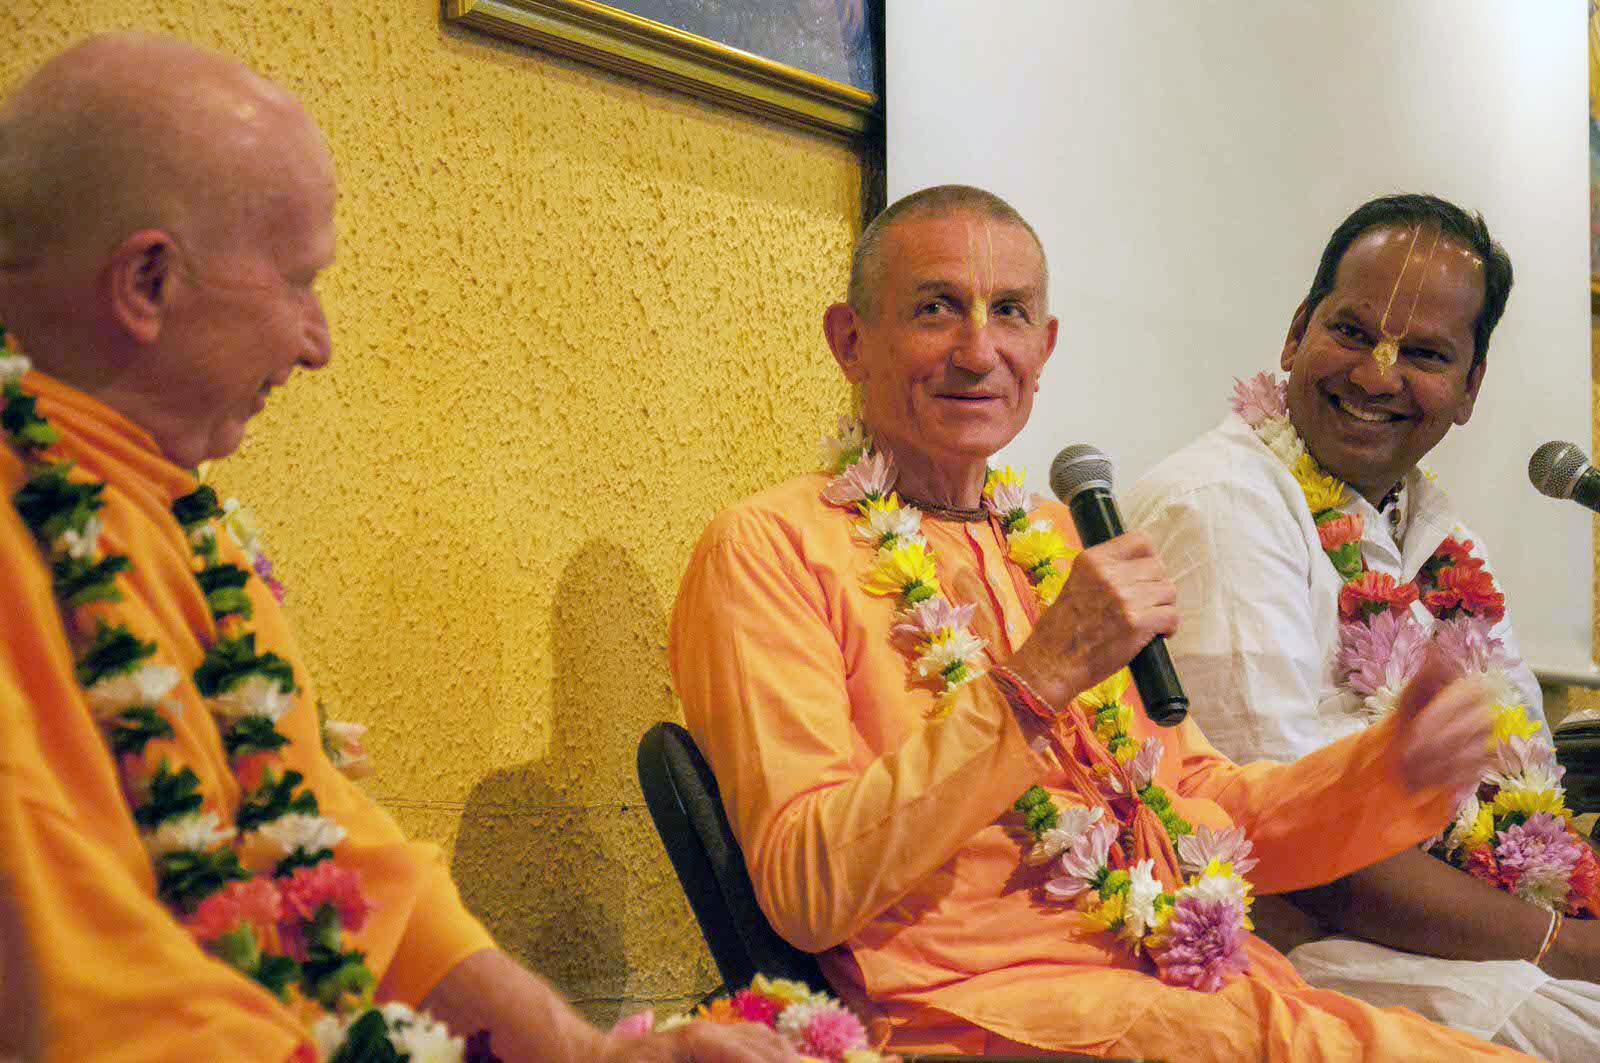 HH Chandramauli Swami, Jananivas prabhu and Brajavilas prabhu during TOVP Euro Tour in Ljubljana, Slovenia